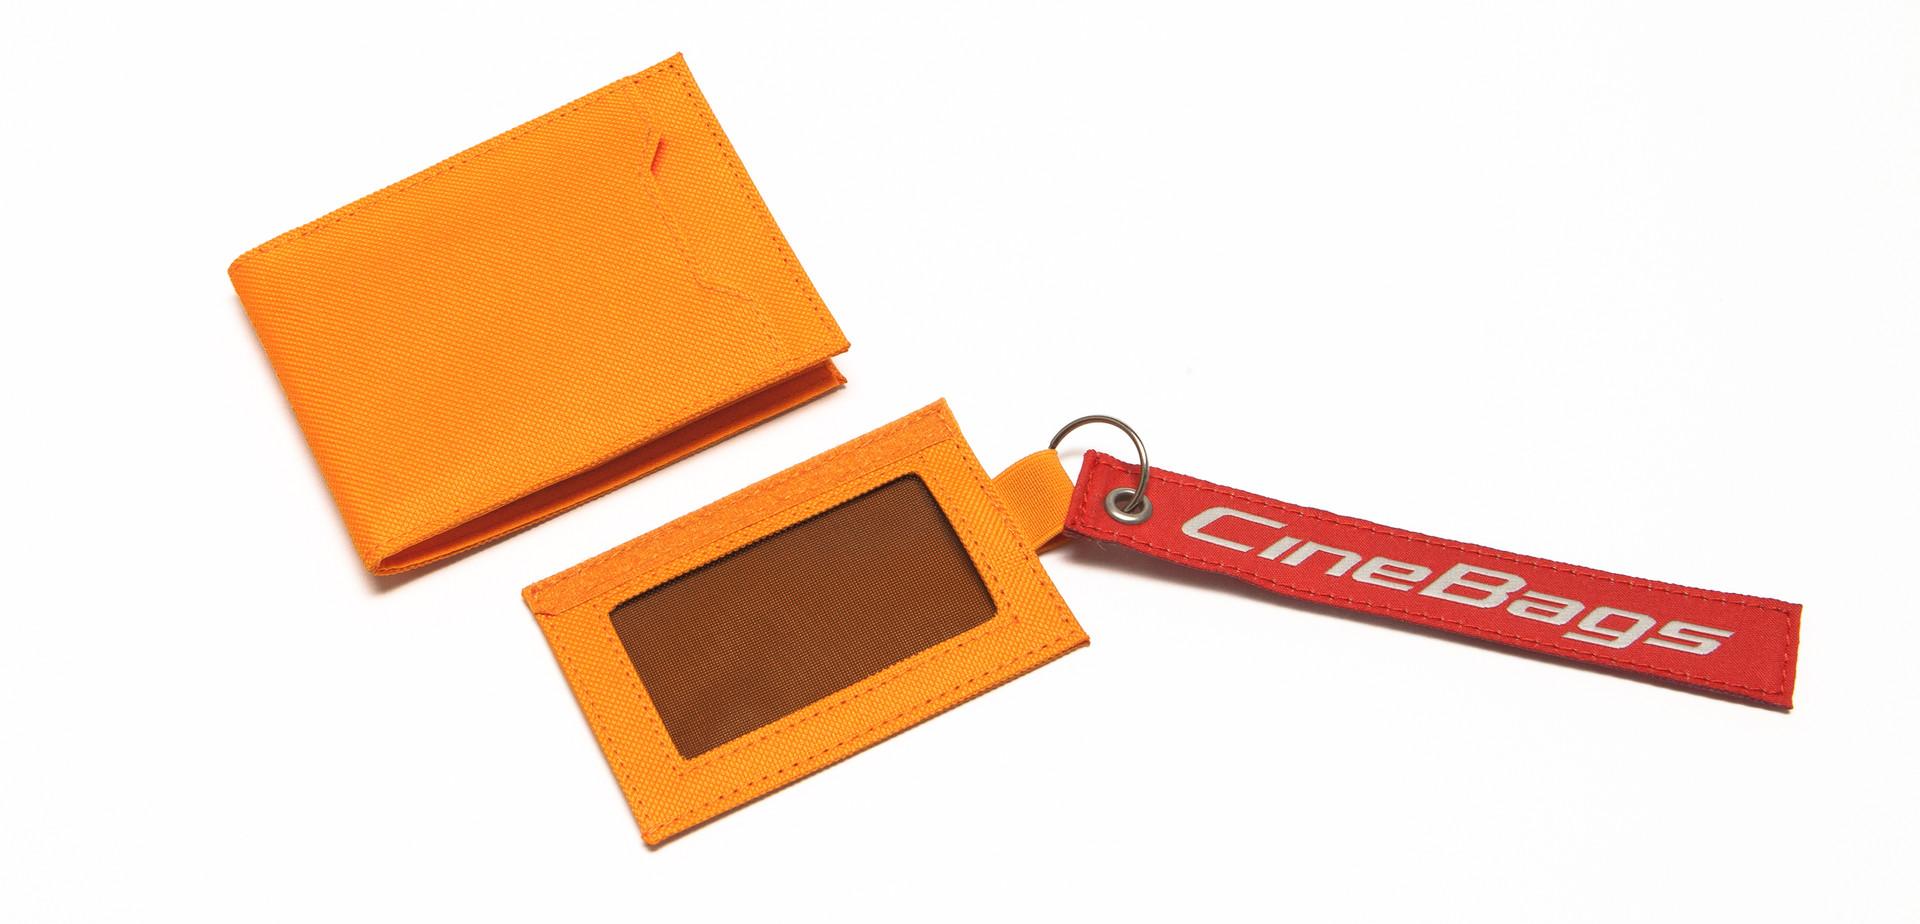 CineBags CB16 Wallet Ornage-4.jpg